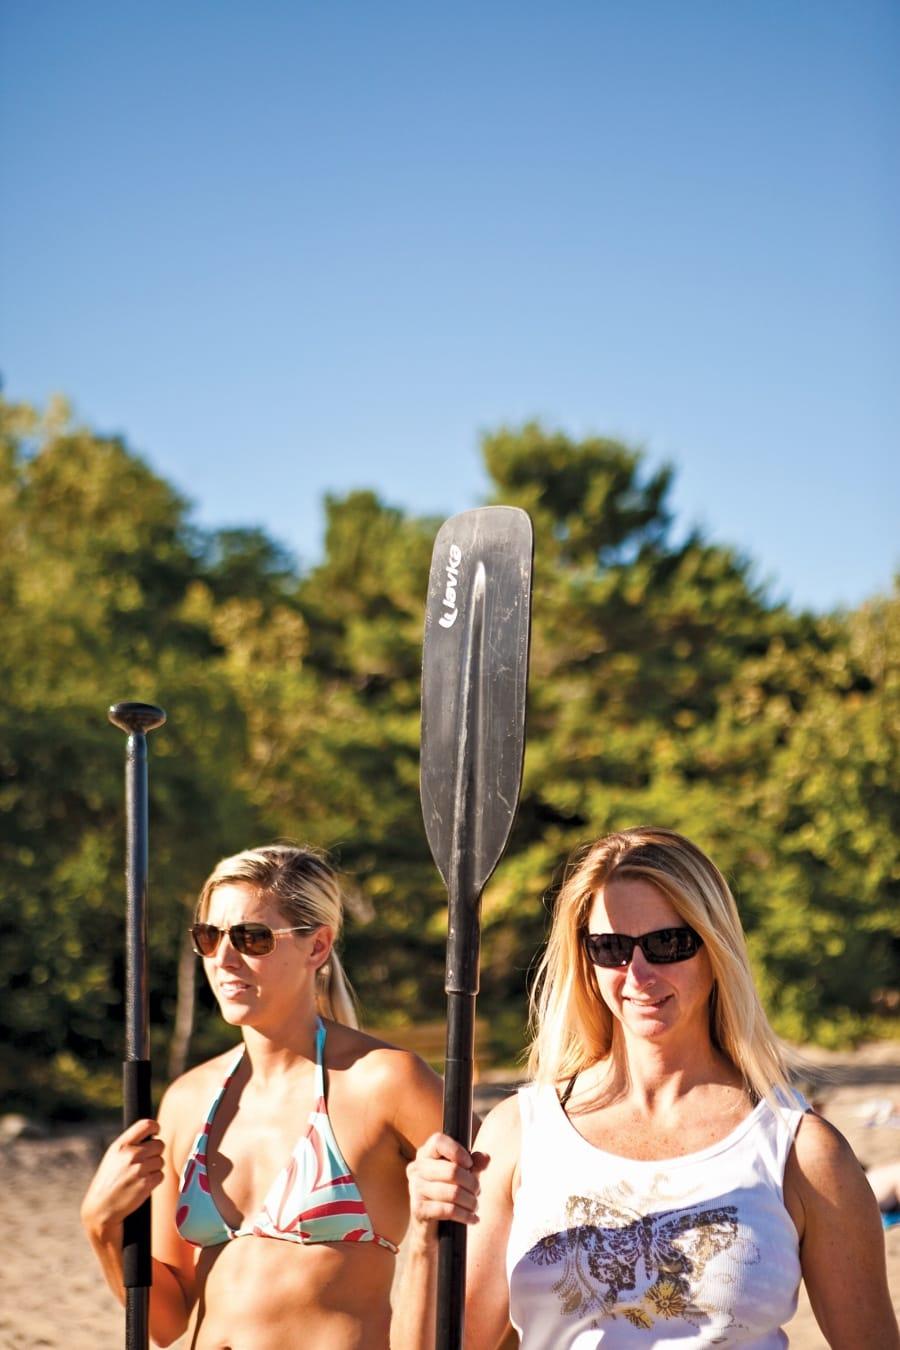 paddle boarding in michigan